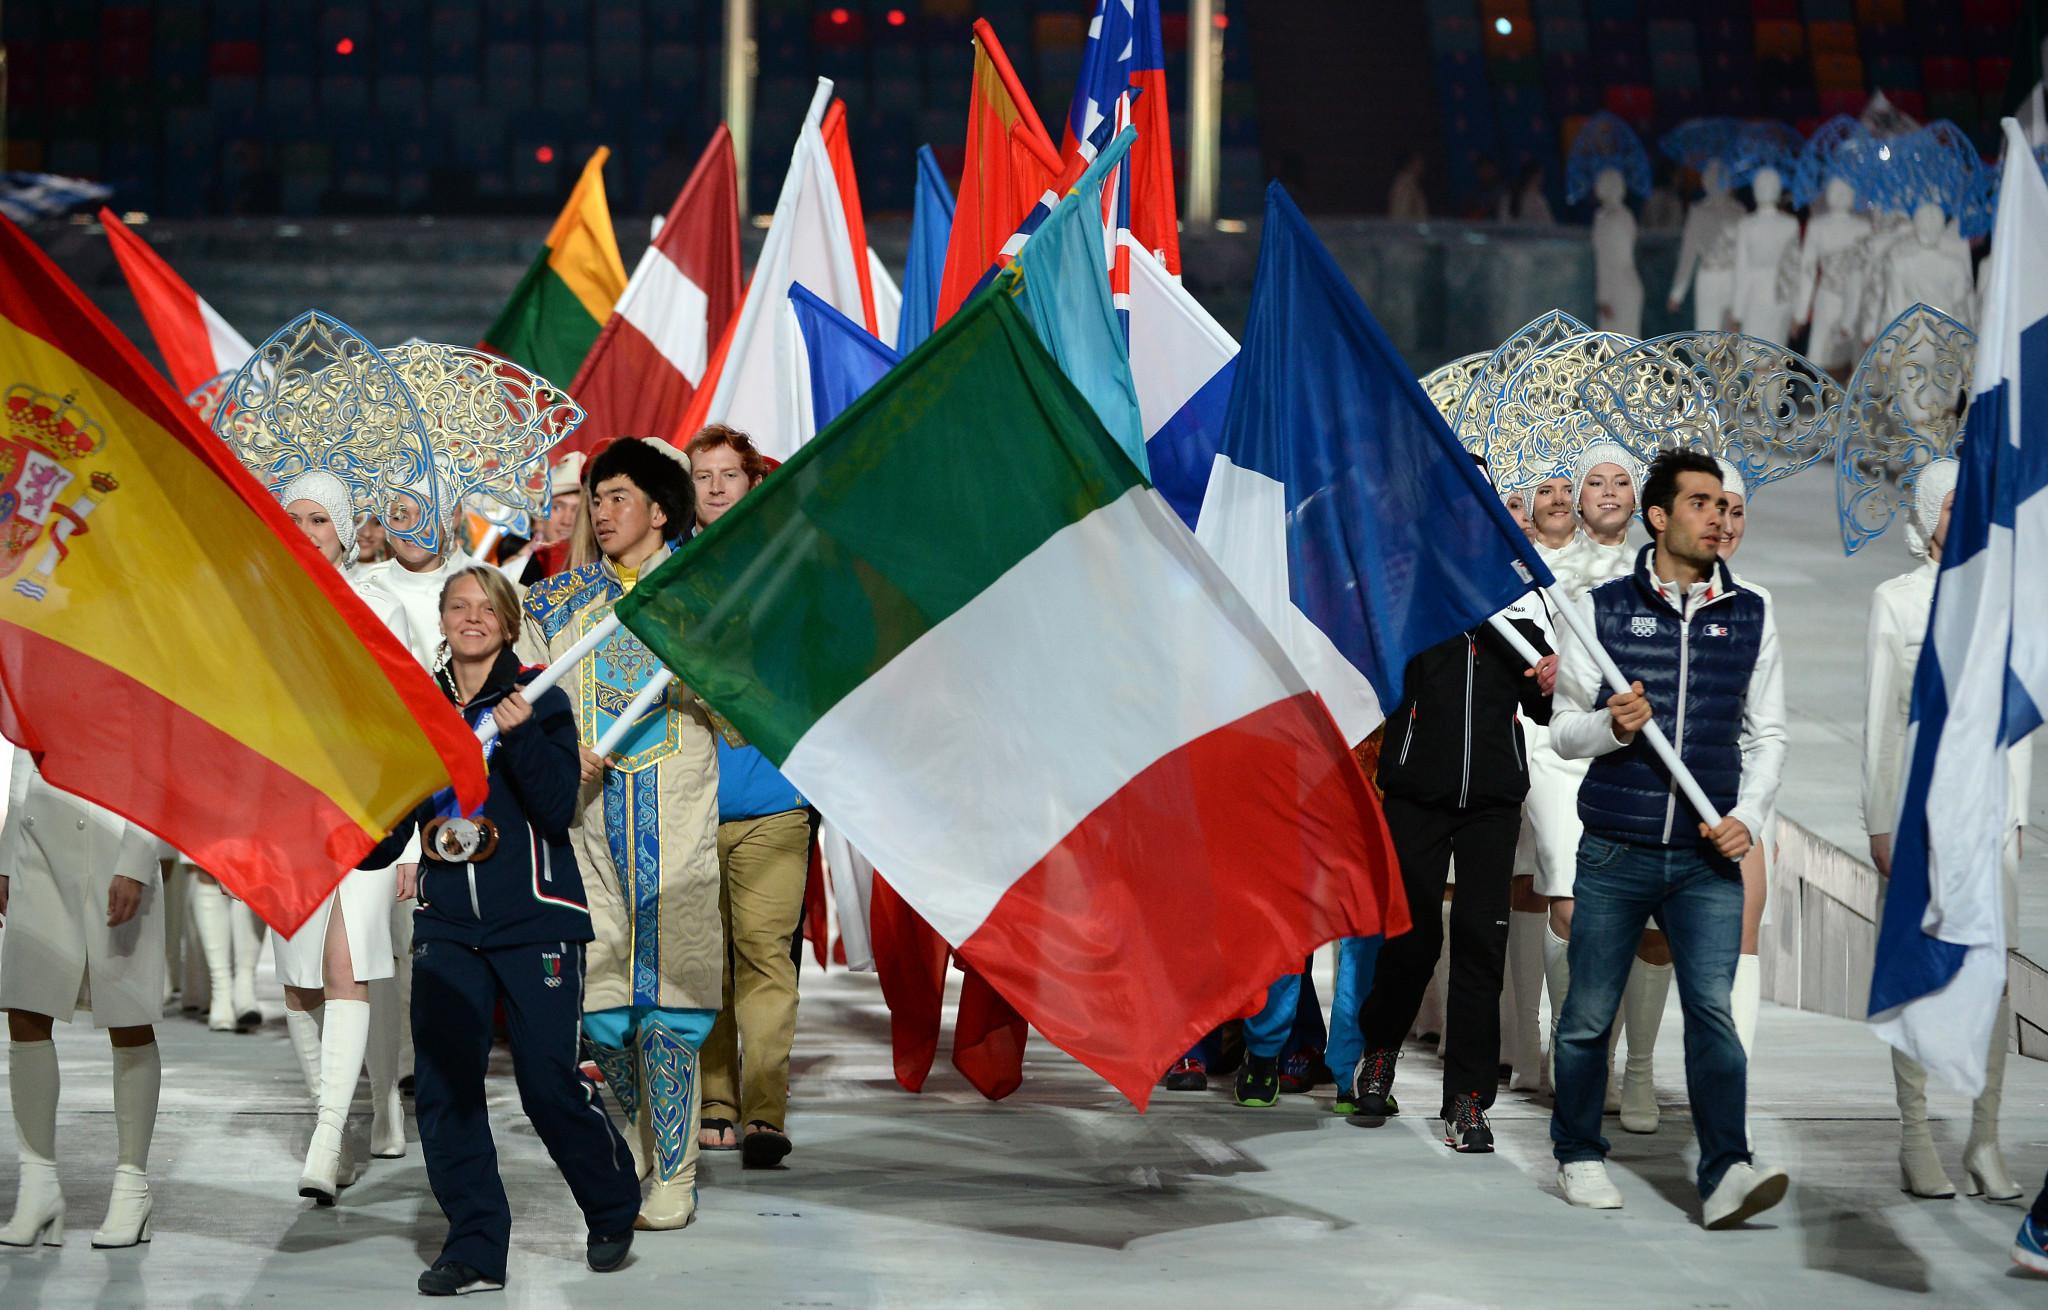 Arianna Fontana carried Italy's flag at the Closing Ceremony of Sochi 2014